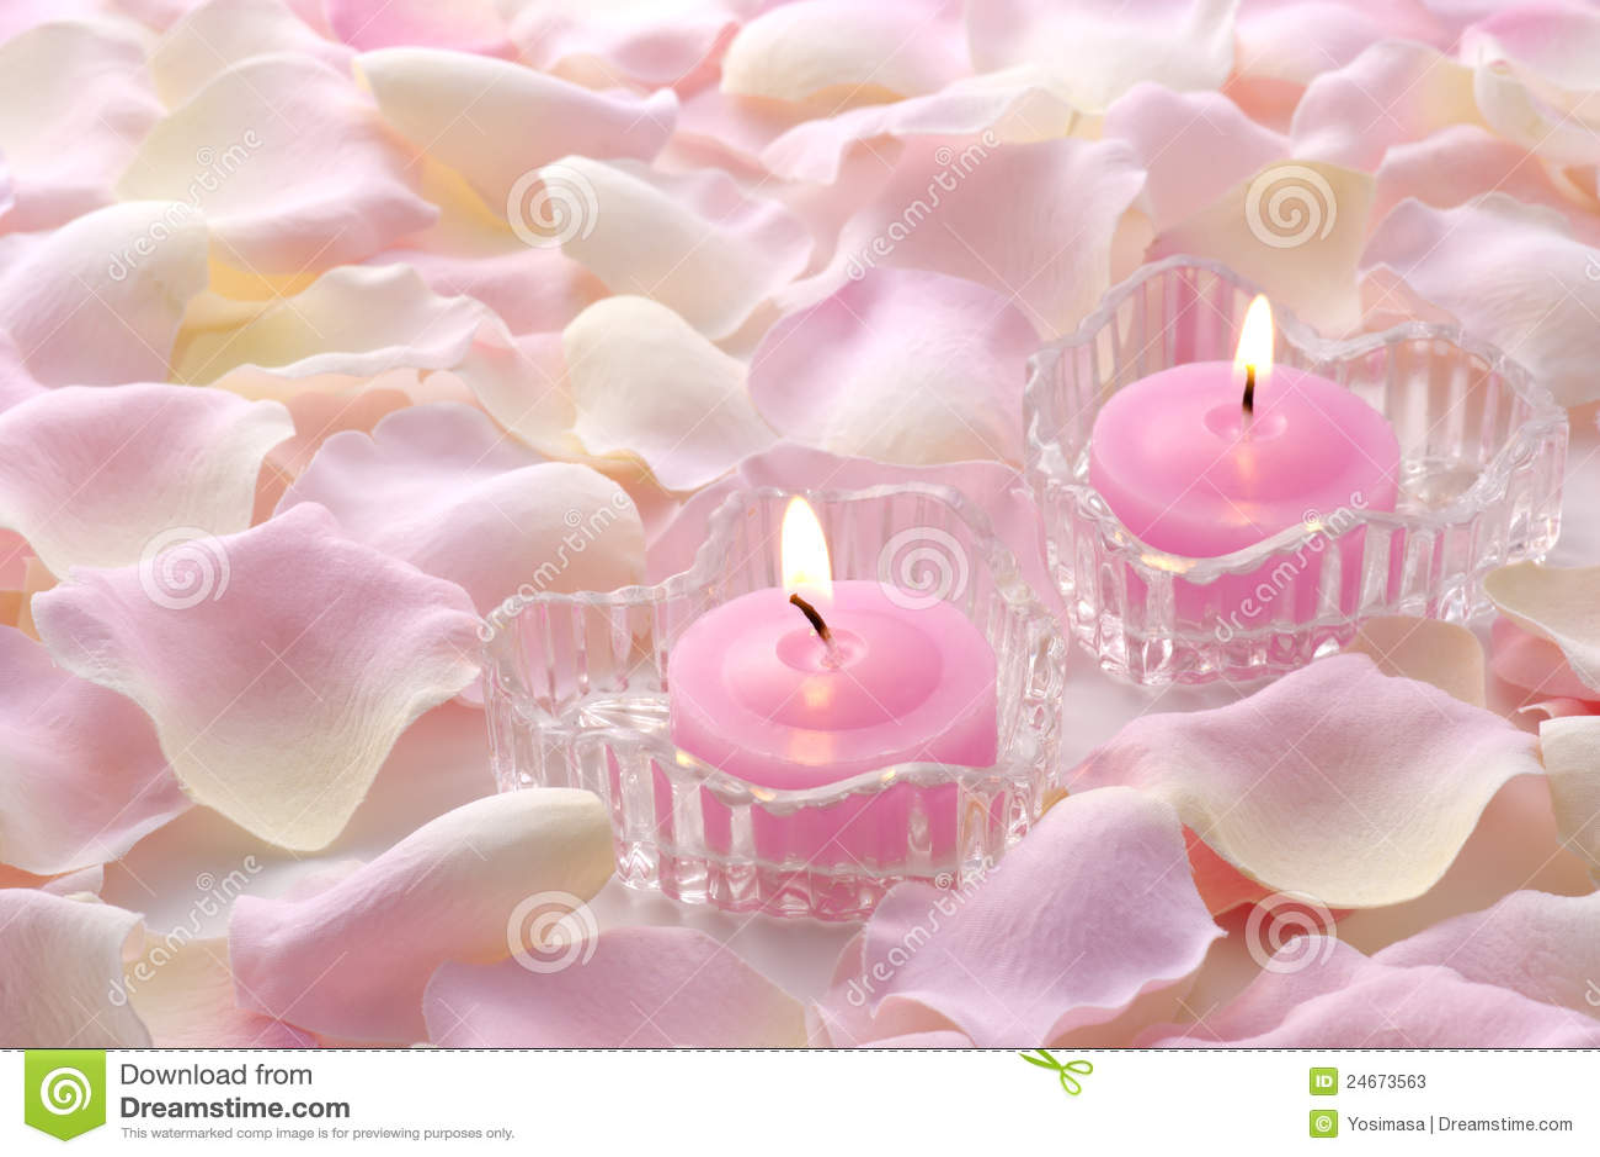 Single Rose Wallpaper Hd Pink Candles Stock Photos Image 24673563